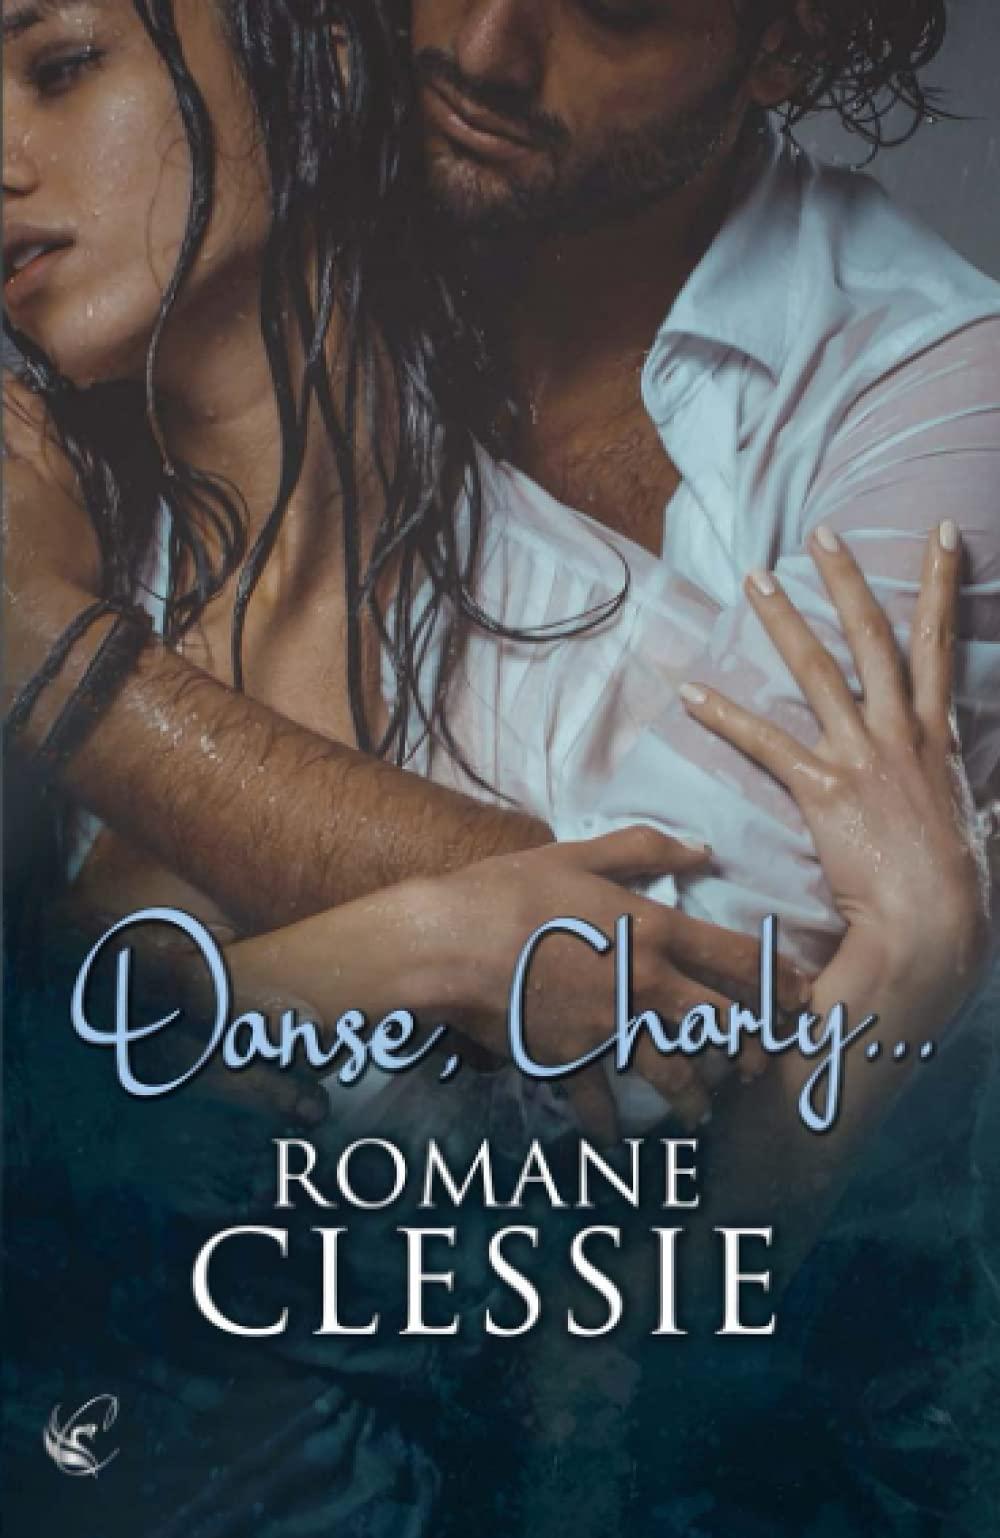 Danse, Charly ... de Romane Clessie 61veel10